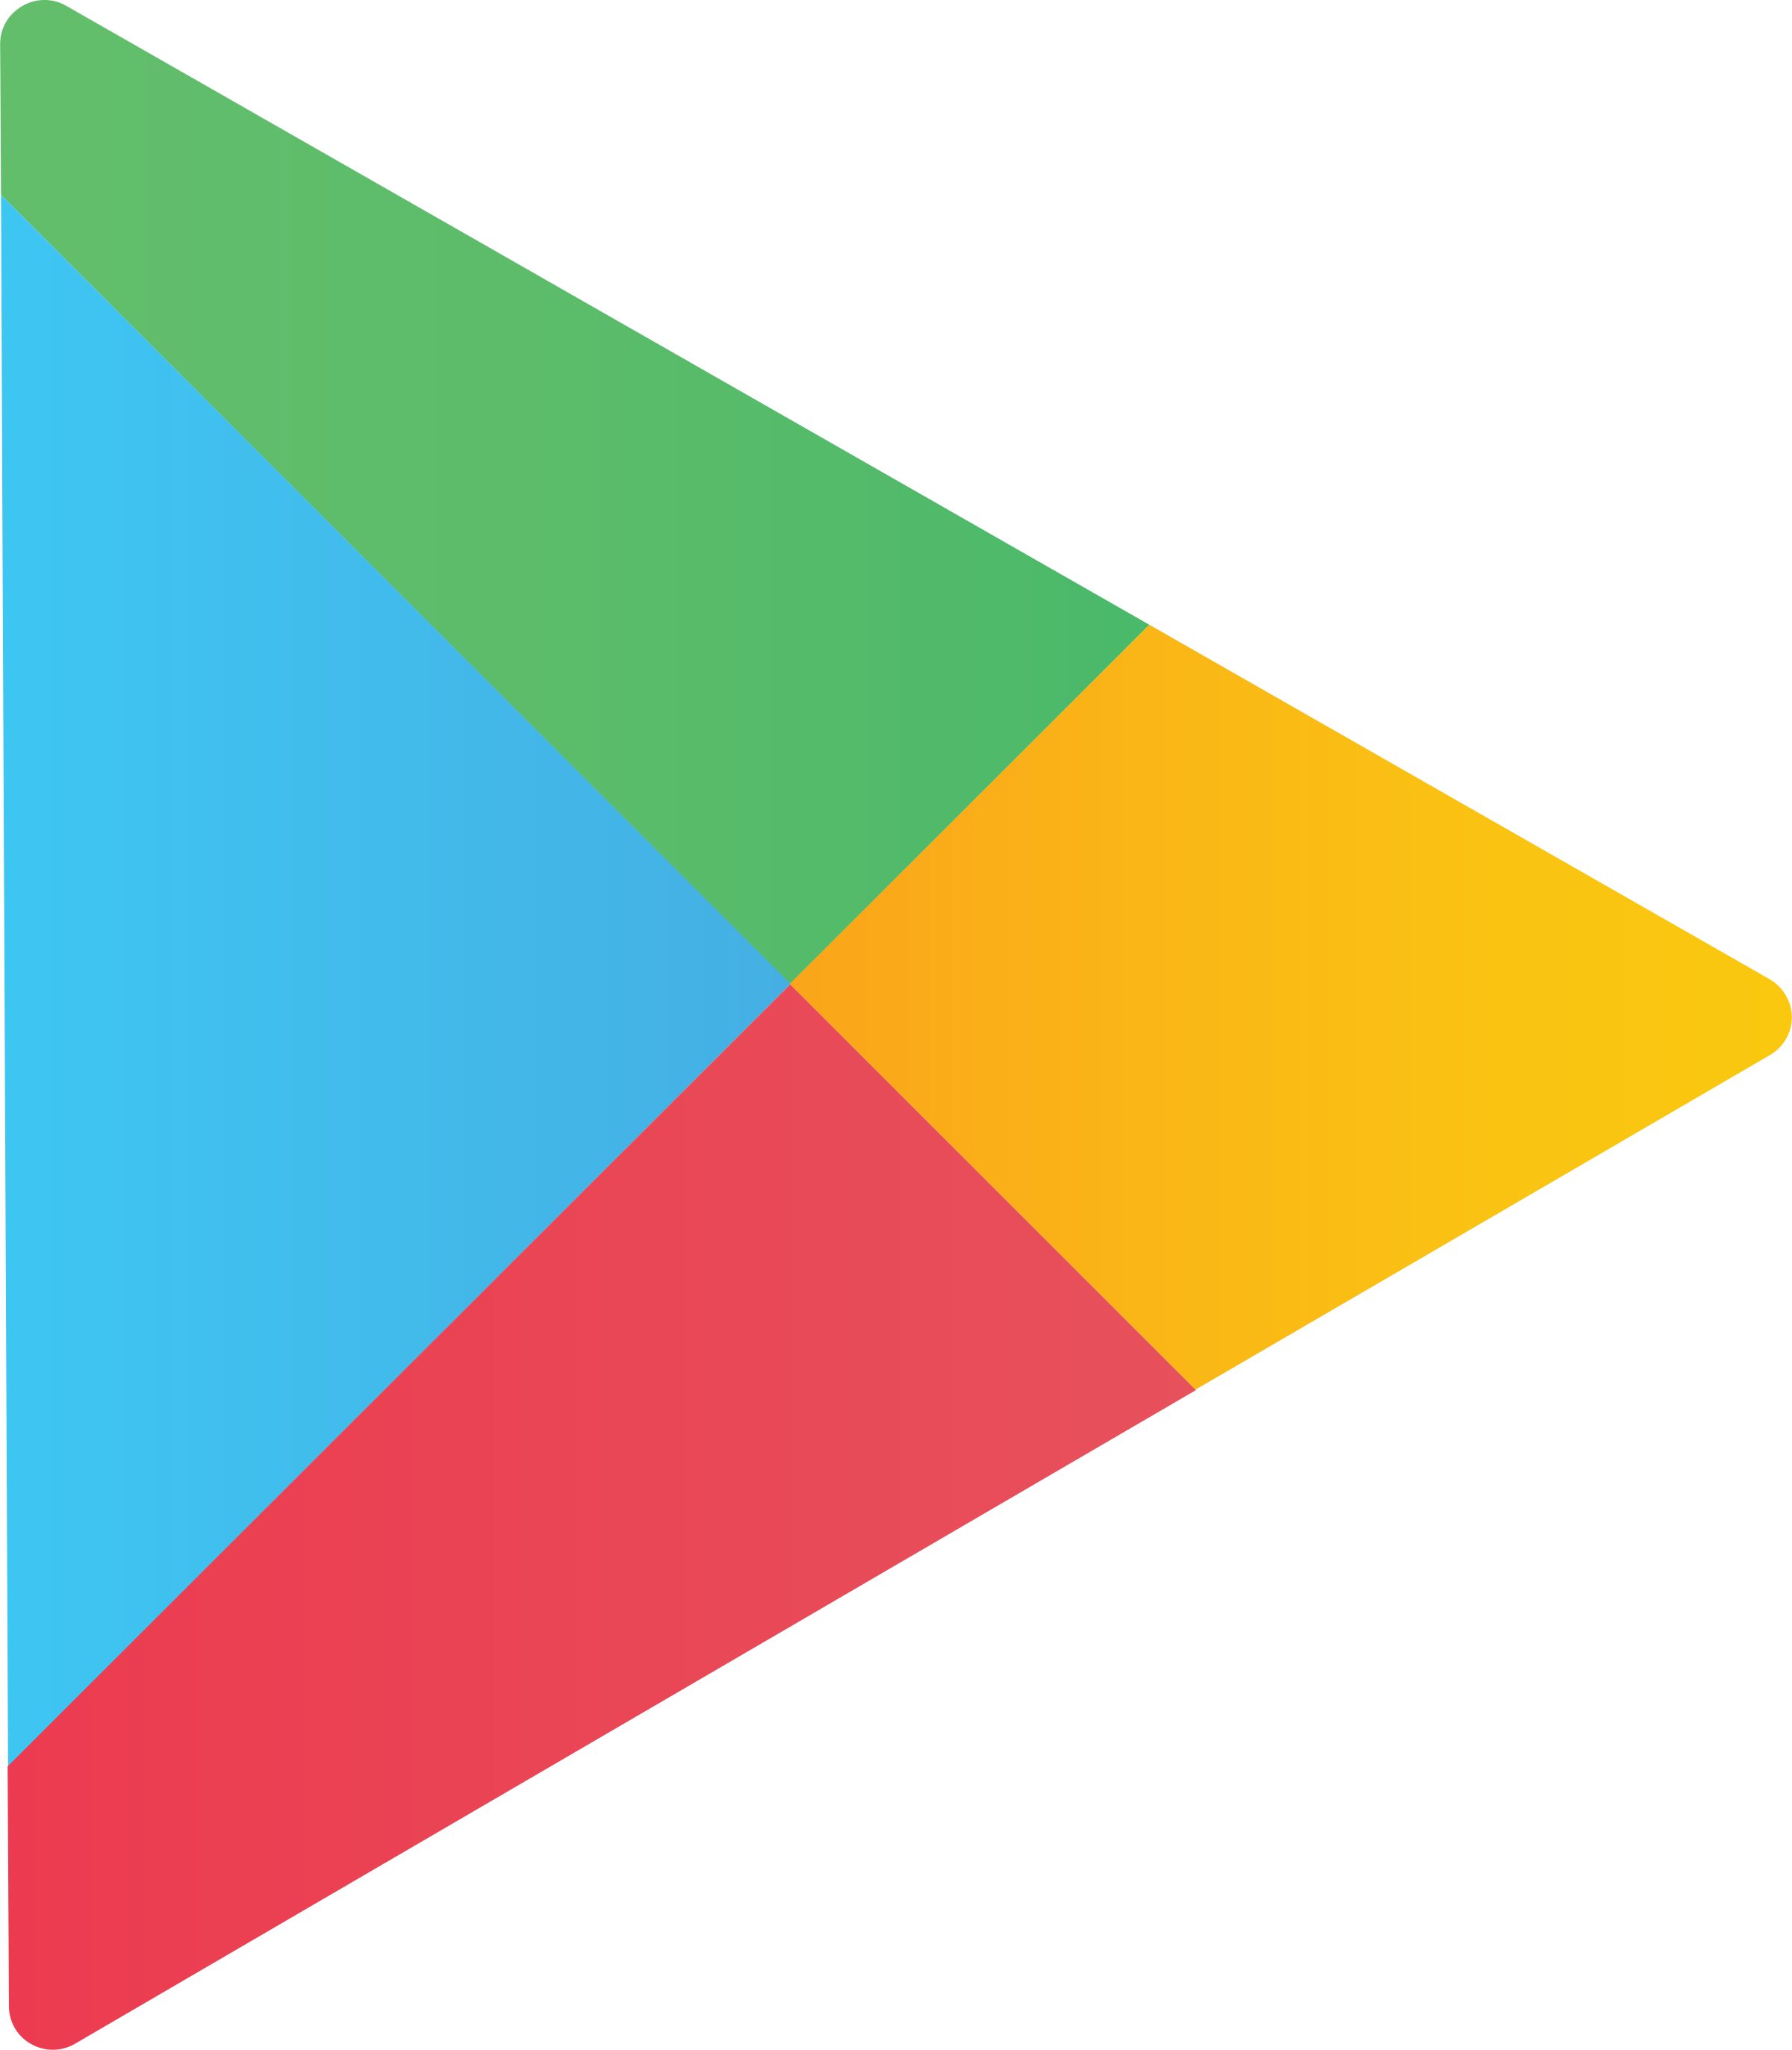 Google Play Store Logo PNG Transparent & SVG Vector.